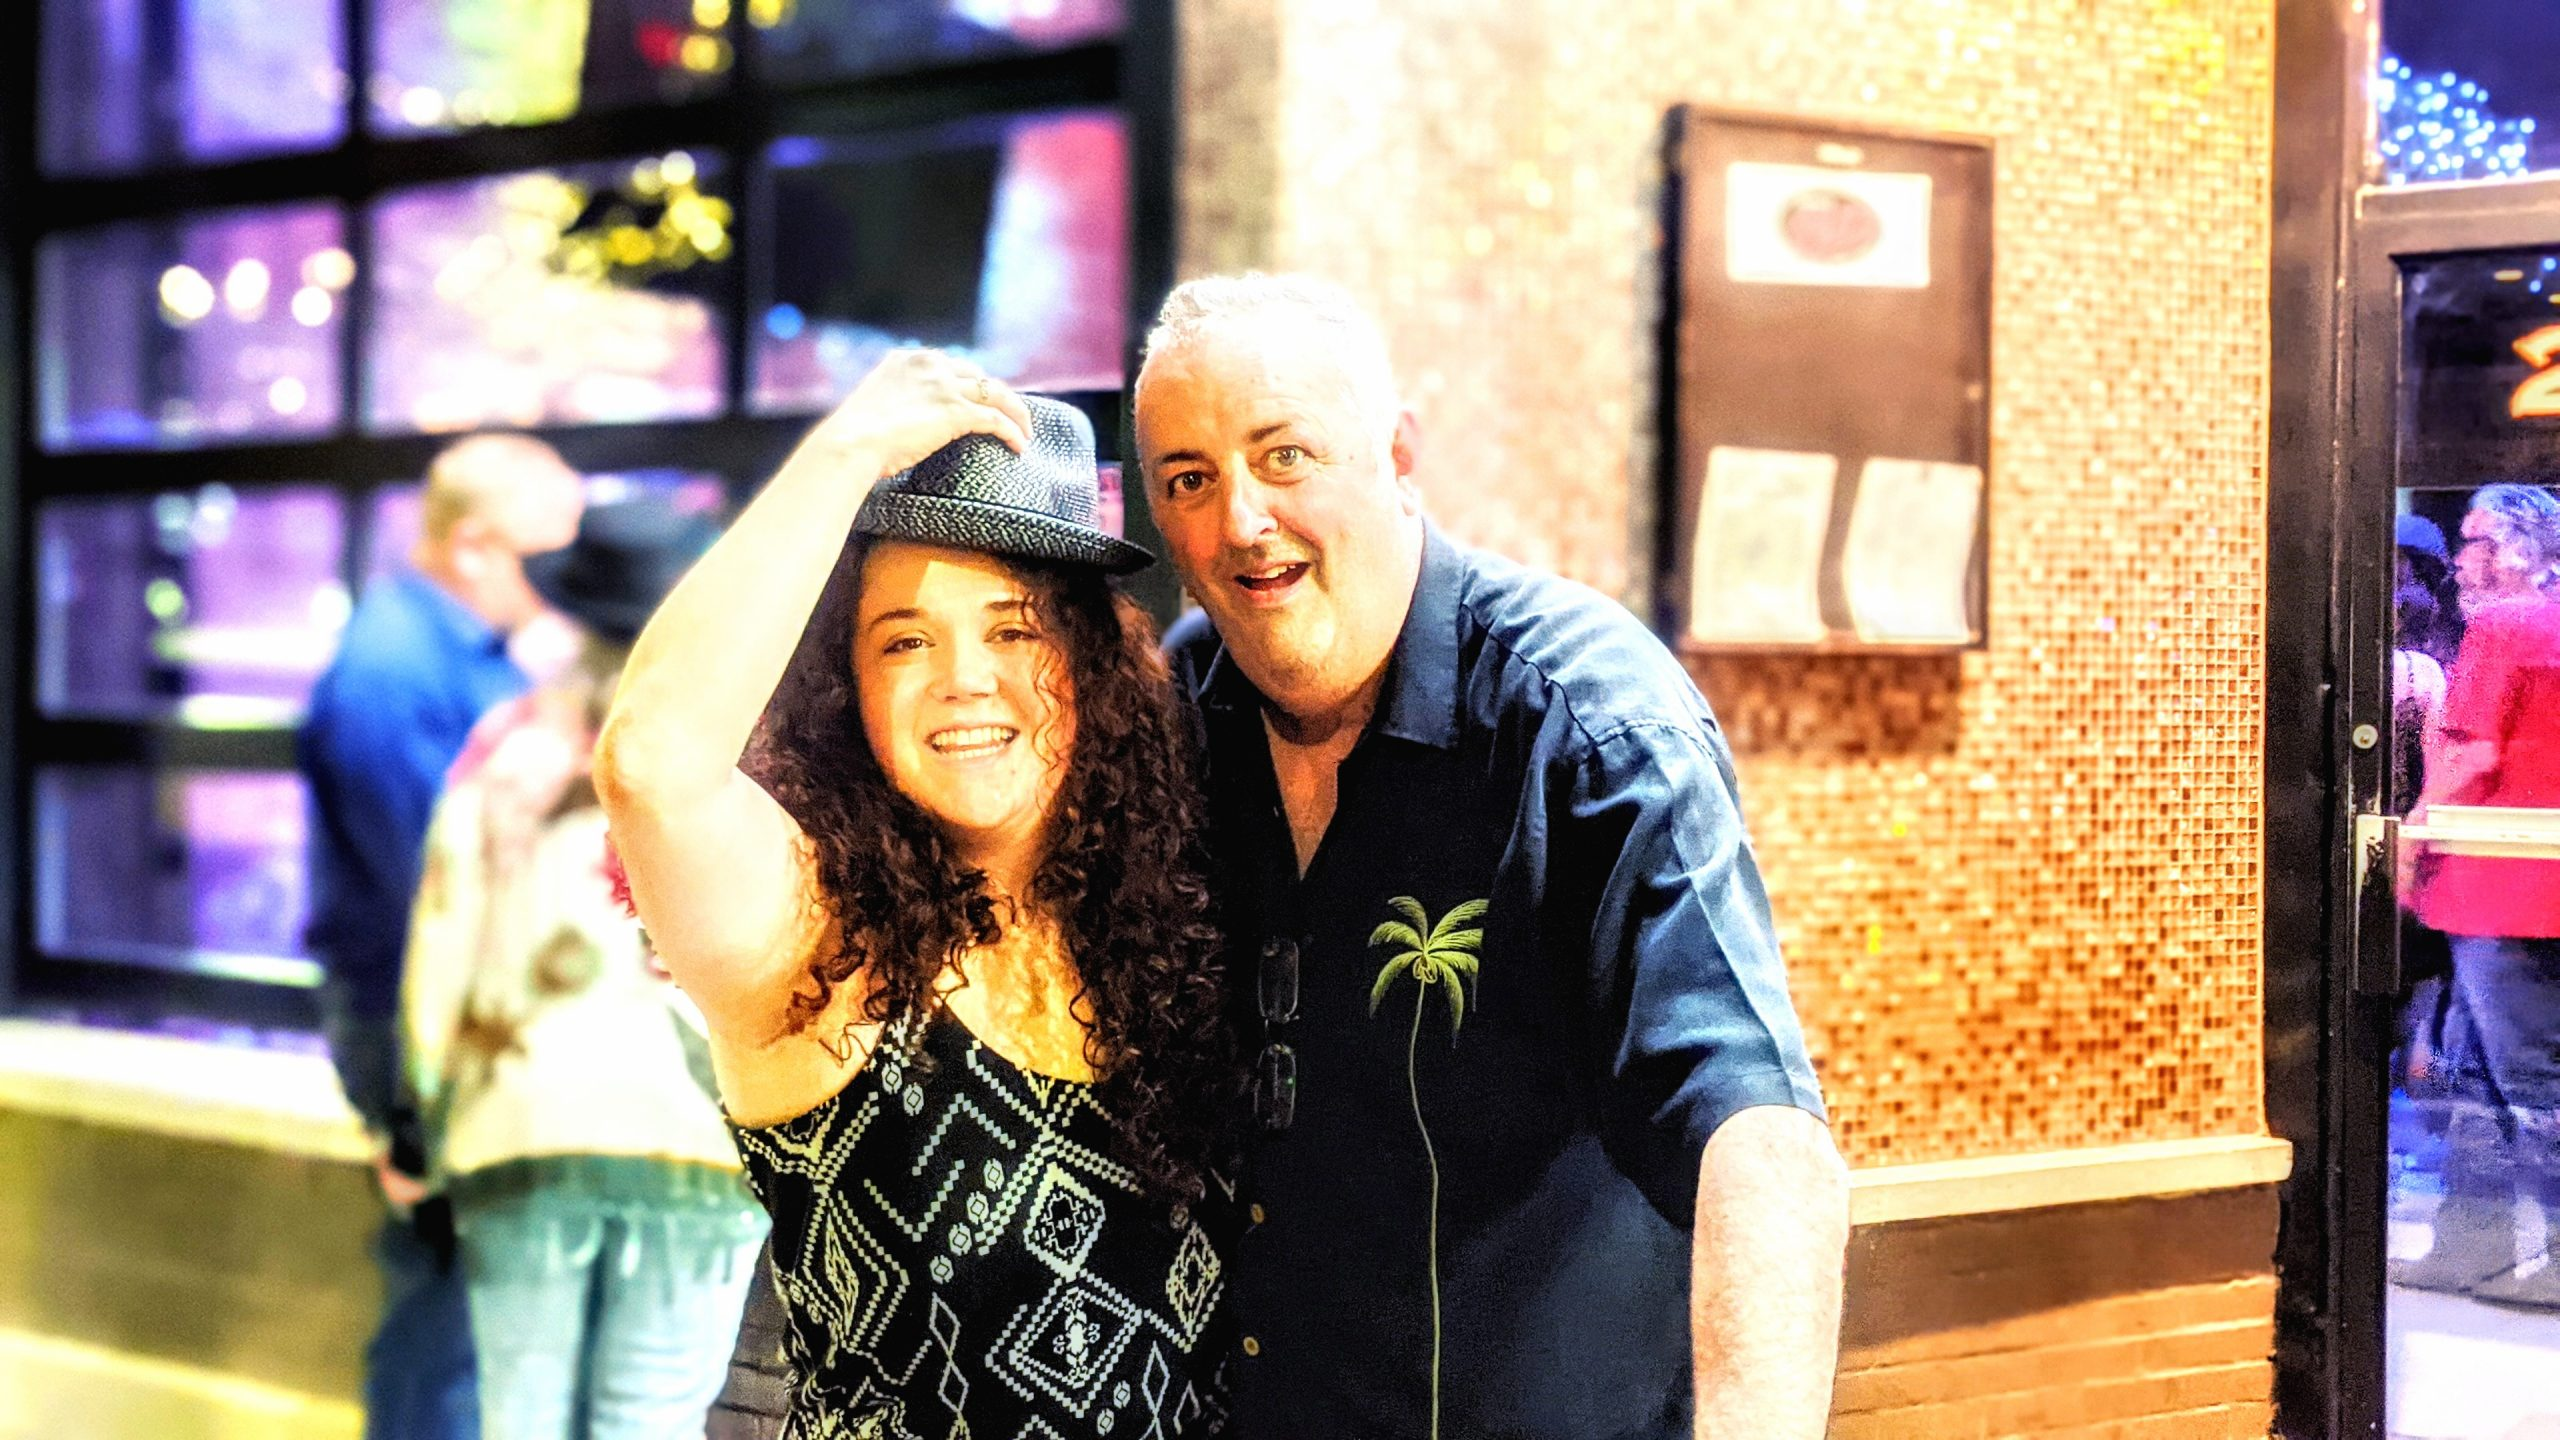 Brian's Open Mic Experiences At Johnny's Blitz Bar & Grill 23